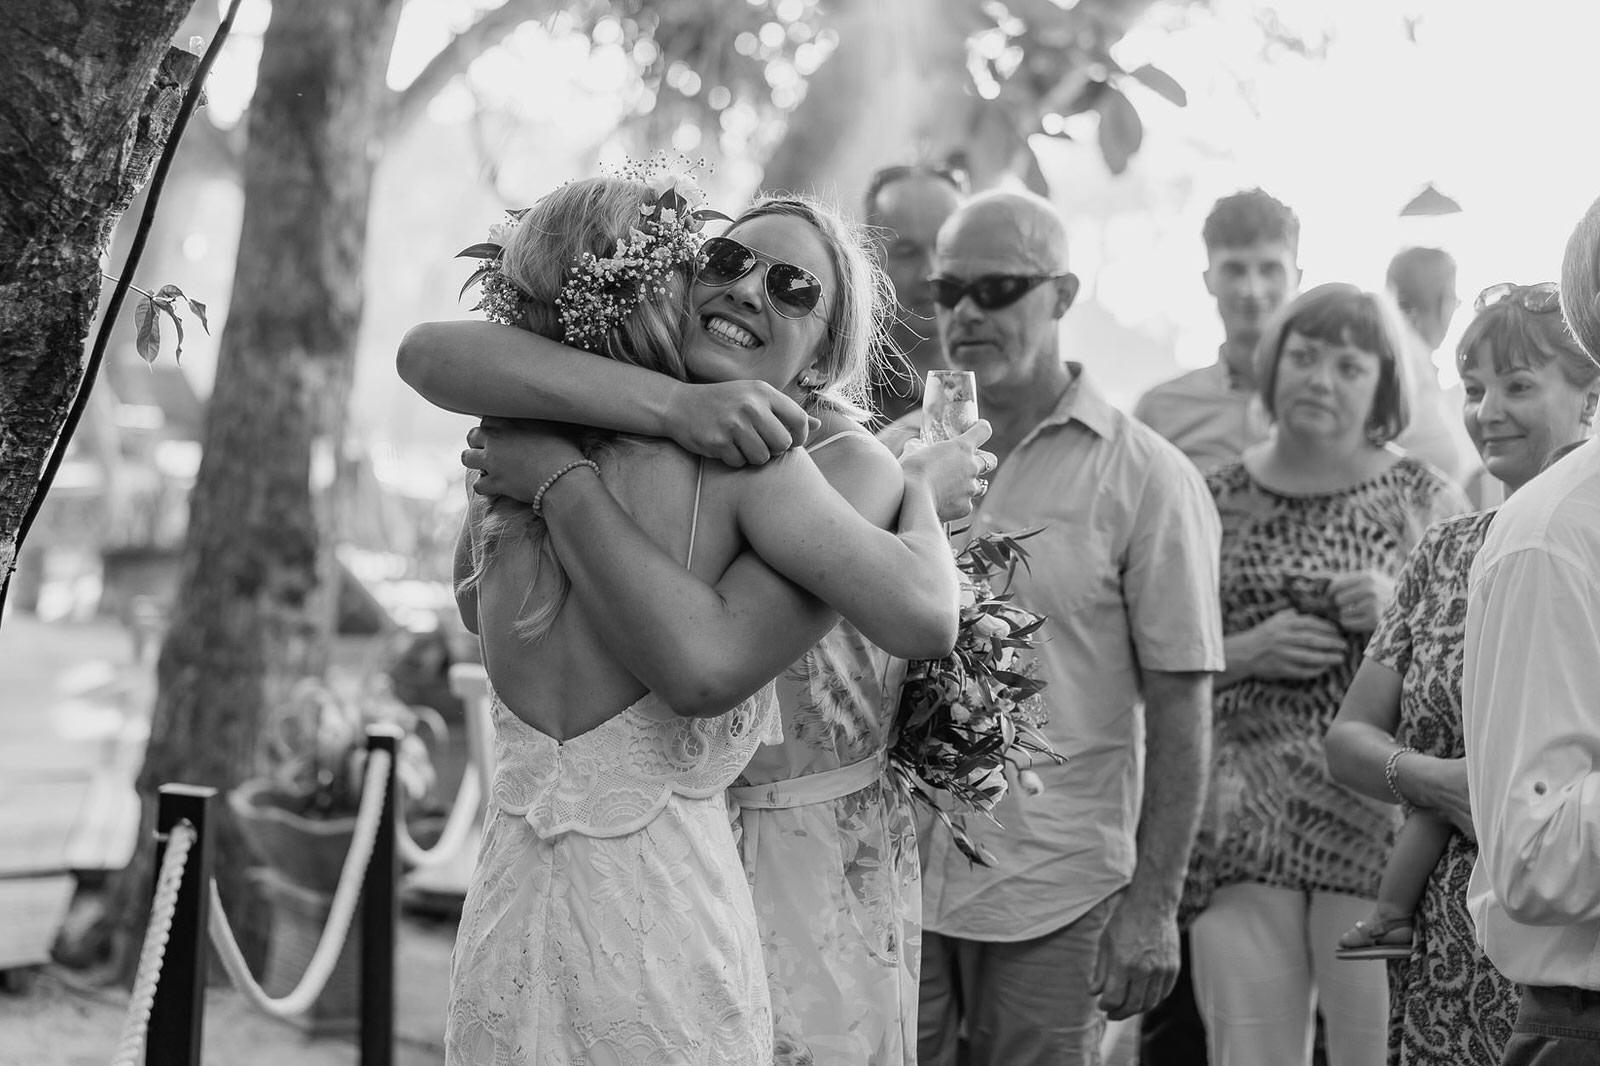 newfound-hai-tide-nusa-lembongan-bali-wedding-photographers-125